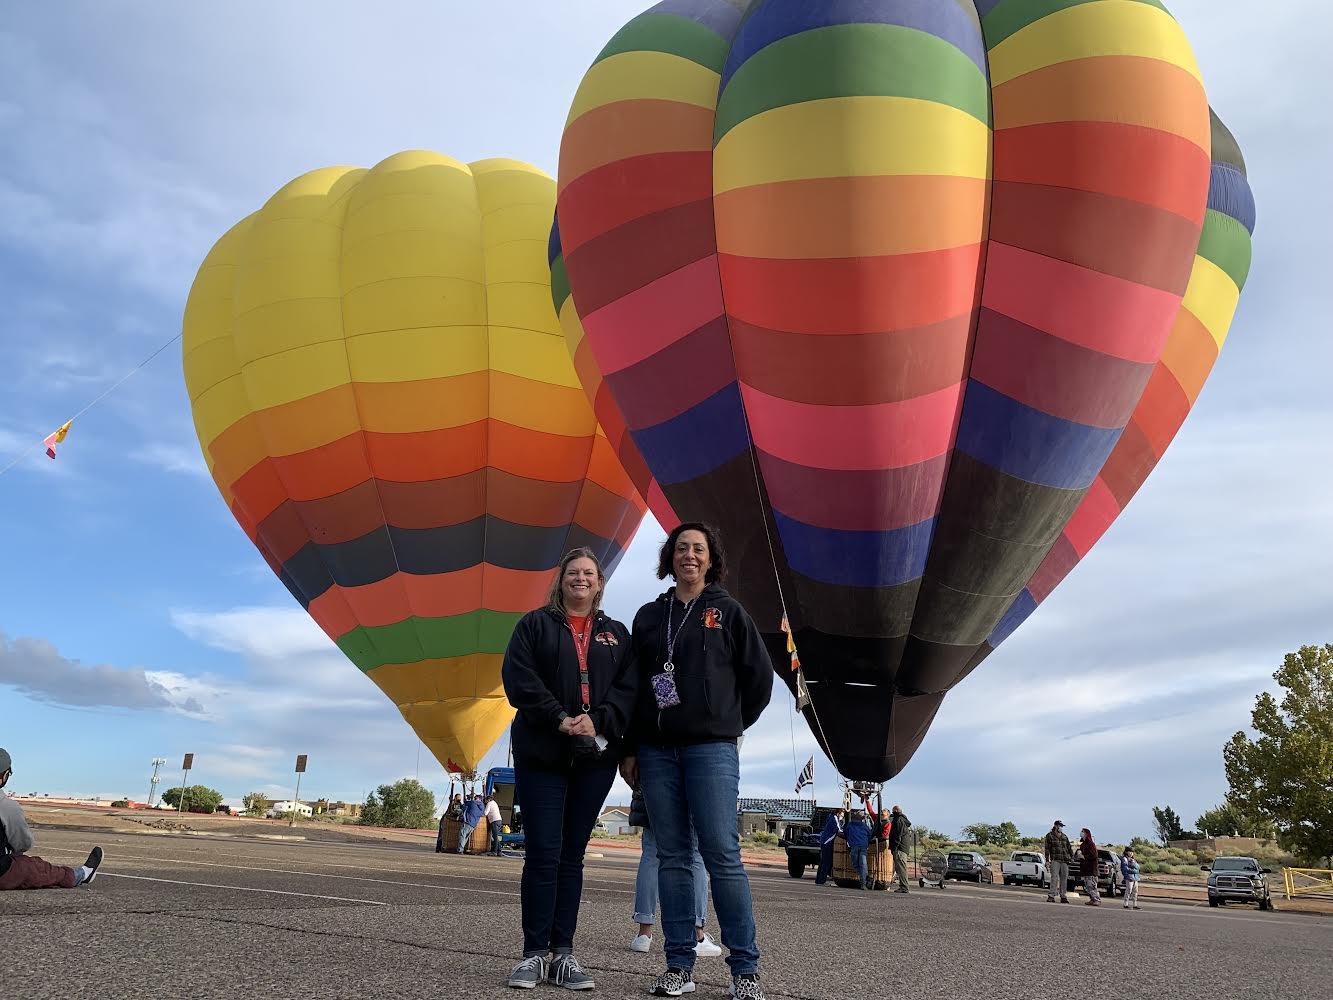 Principal Stephanie Nieto and Assistant Principal Hollie Zamora enjoy the 2021 Balloons Aloft event